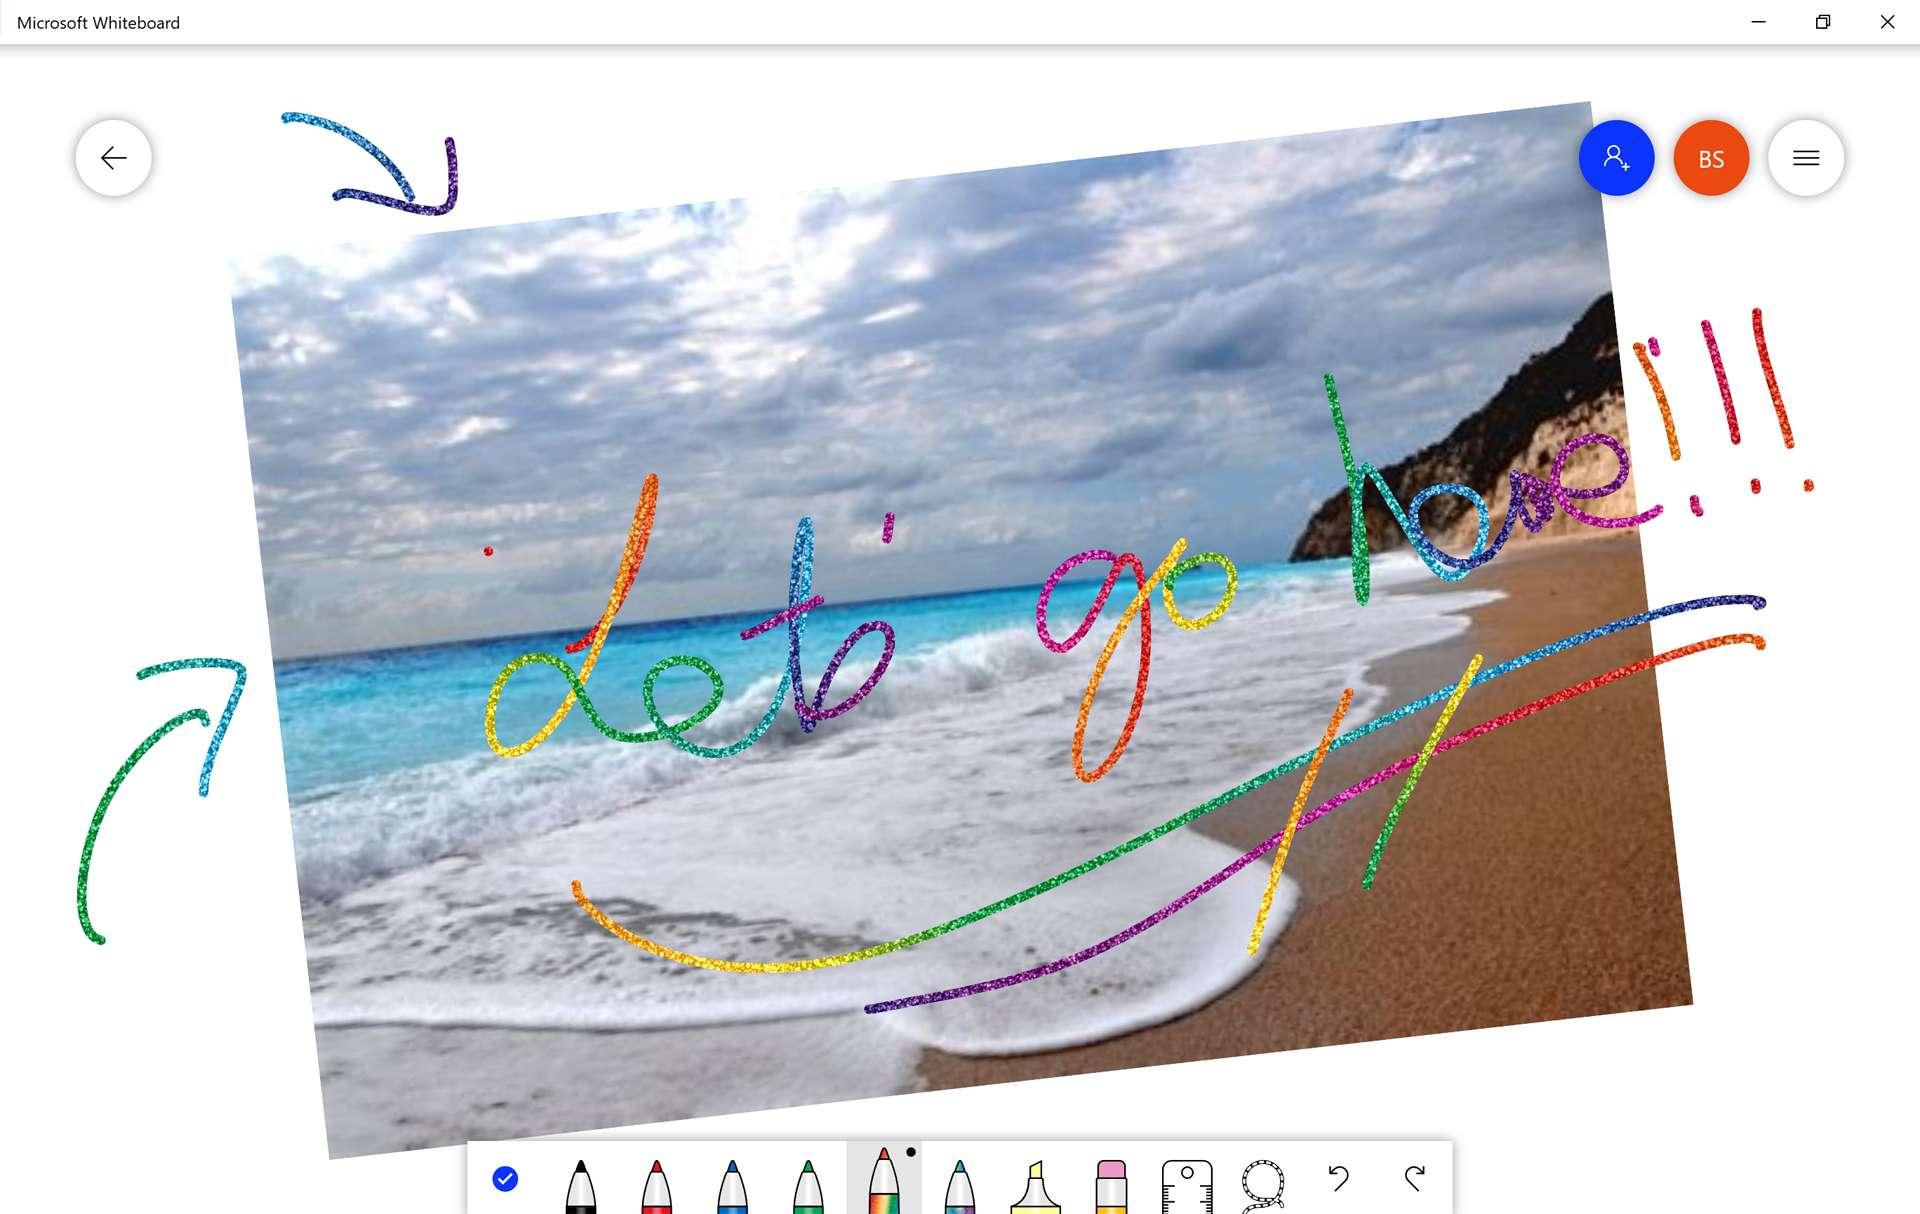 Microsoft Whiteboard drawing app on a Windows 10 Surface Pro.